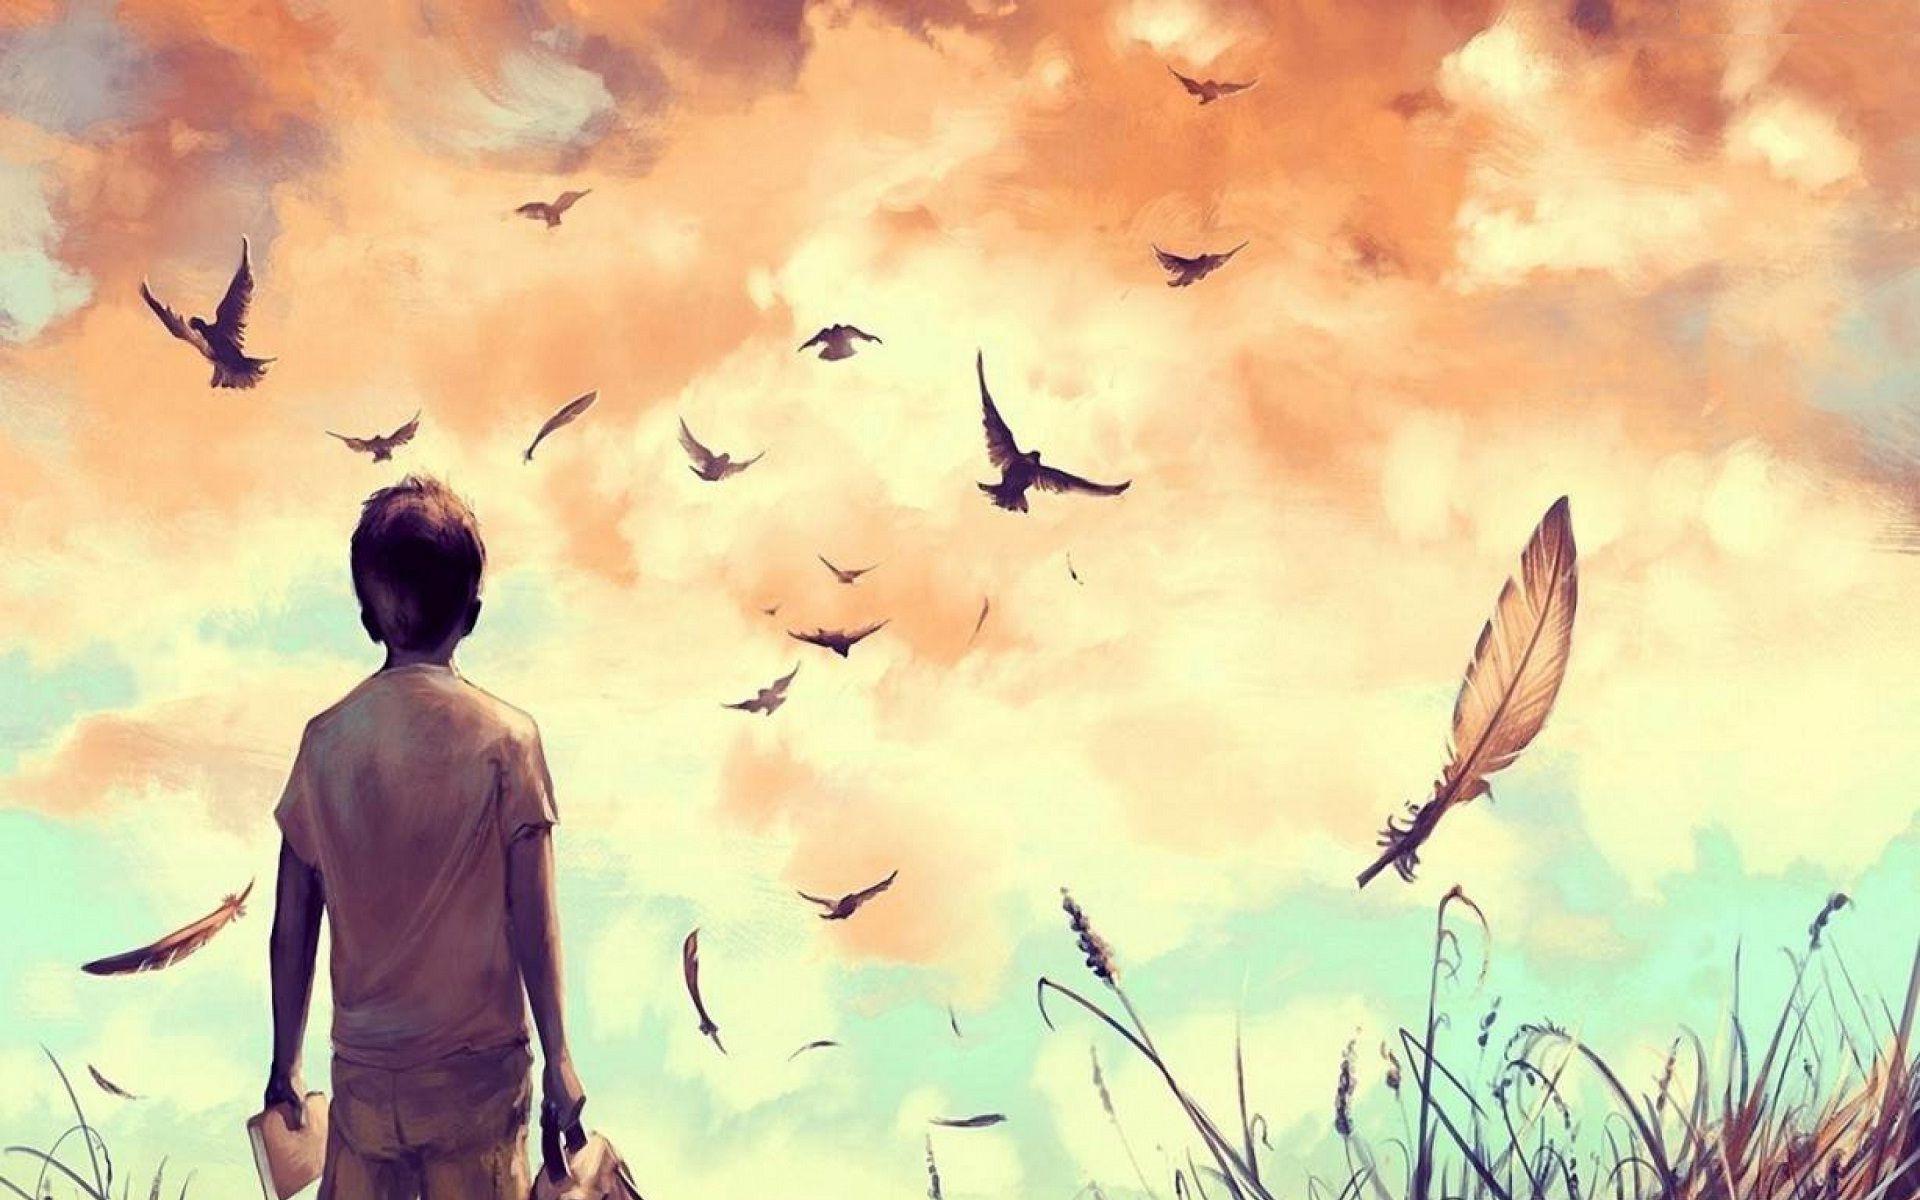 Image Result For Birds Flying Painting Gtygyugggghgh Art